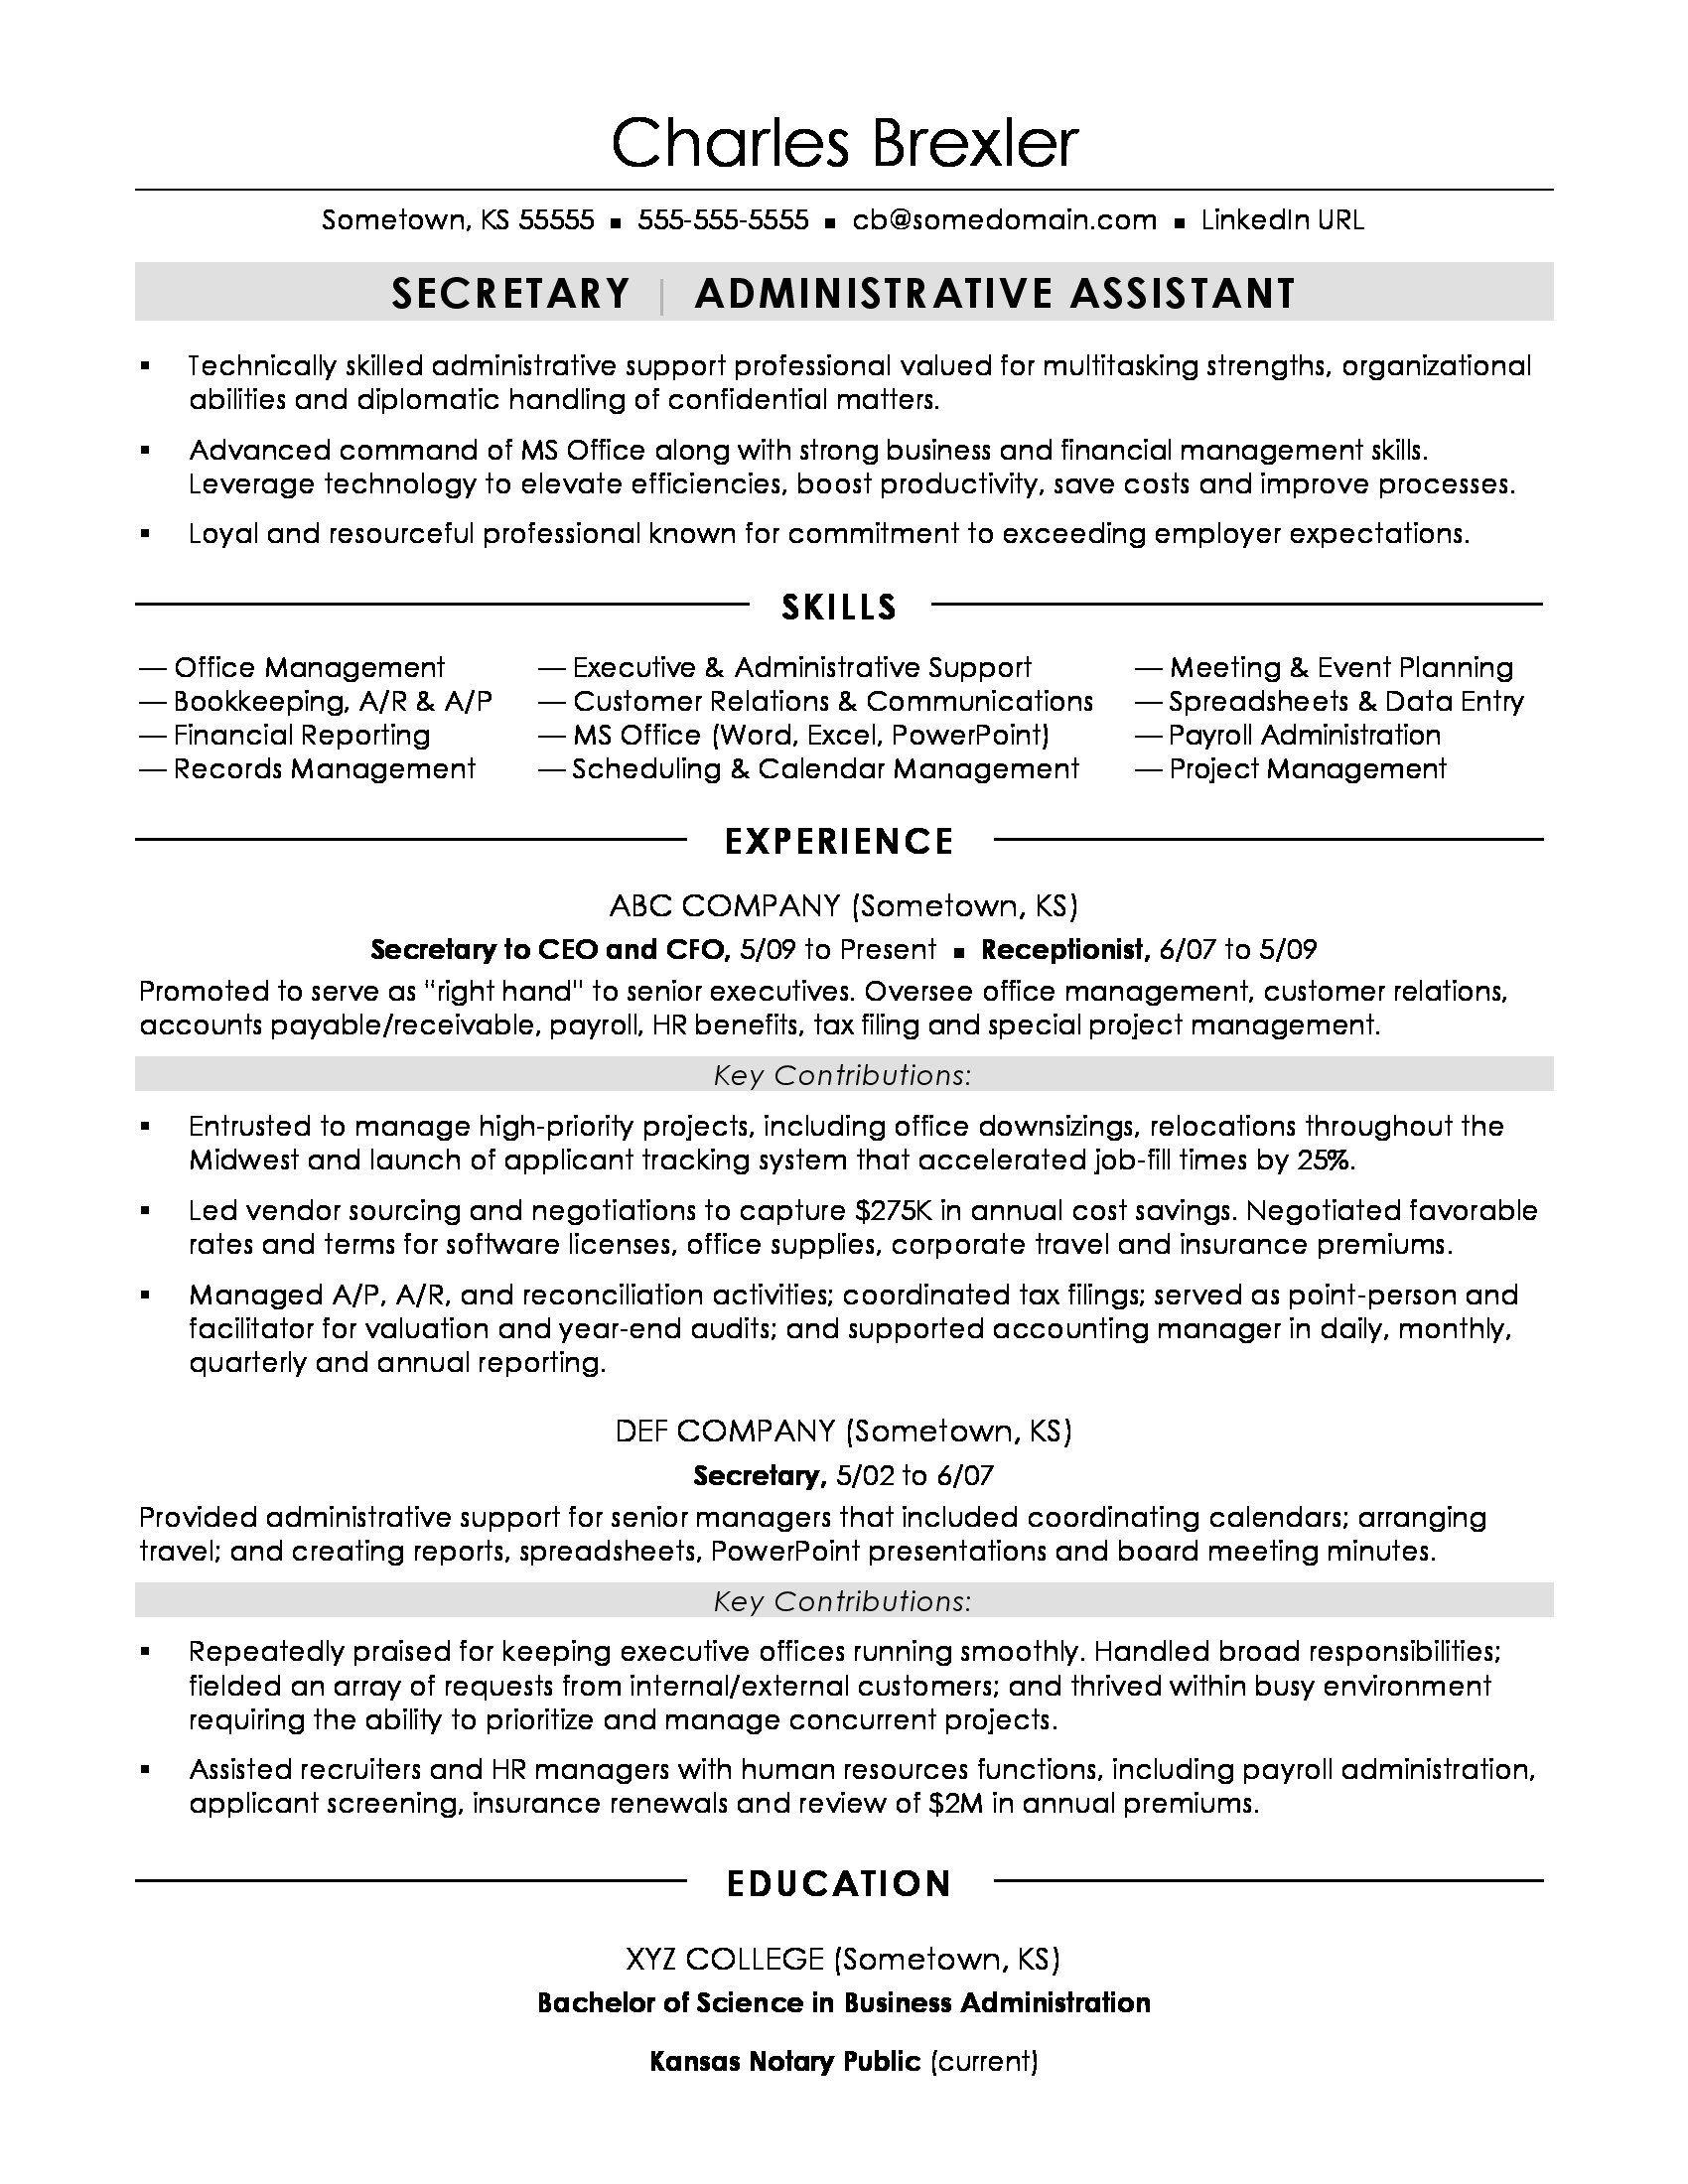 Secretary resume sample Resume words skills, Job resume